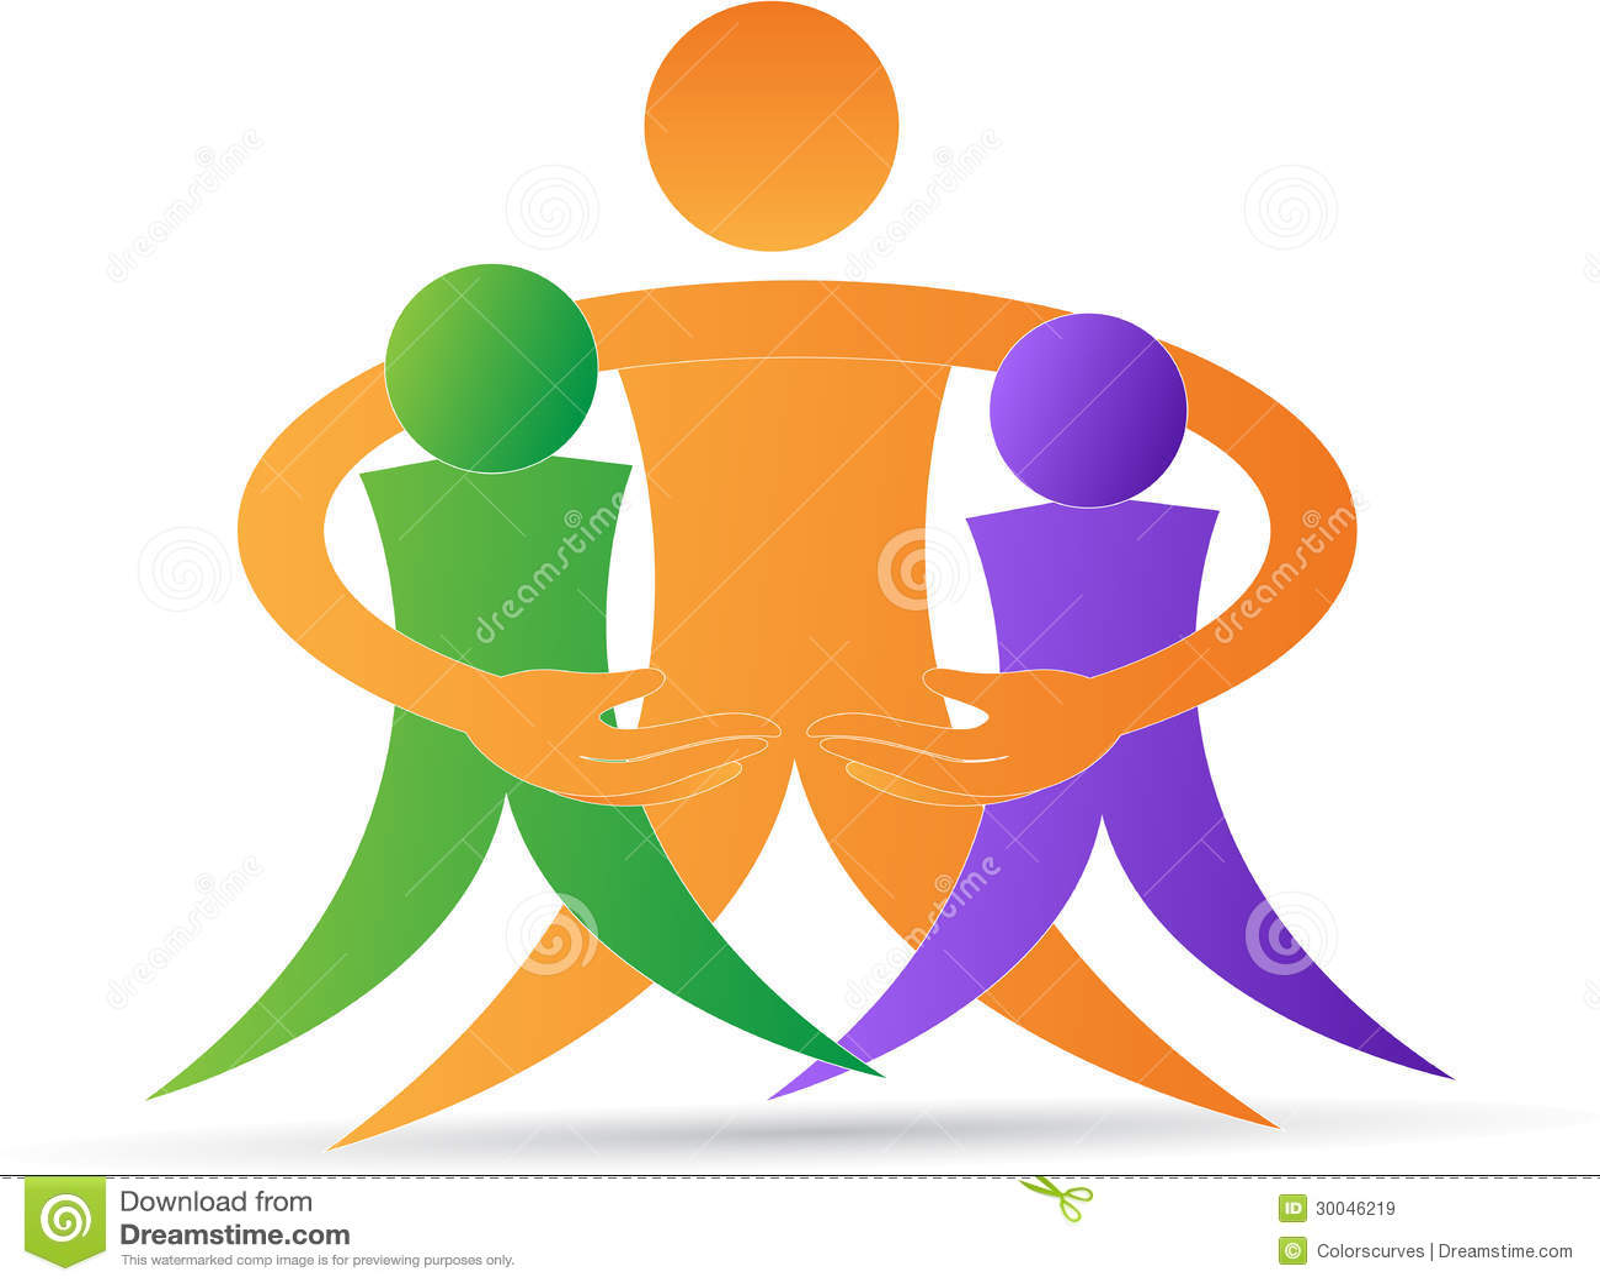 Humanity Logo Royalty Free Stock Images - Image: 30046219